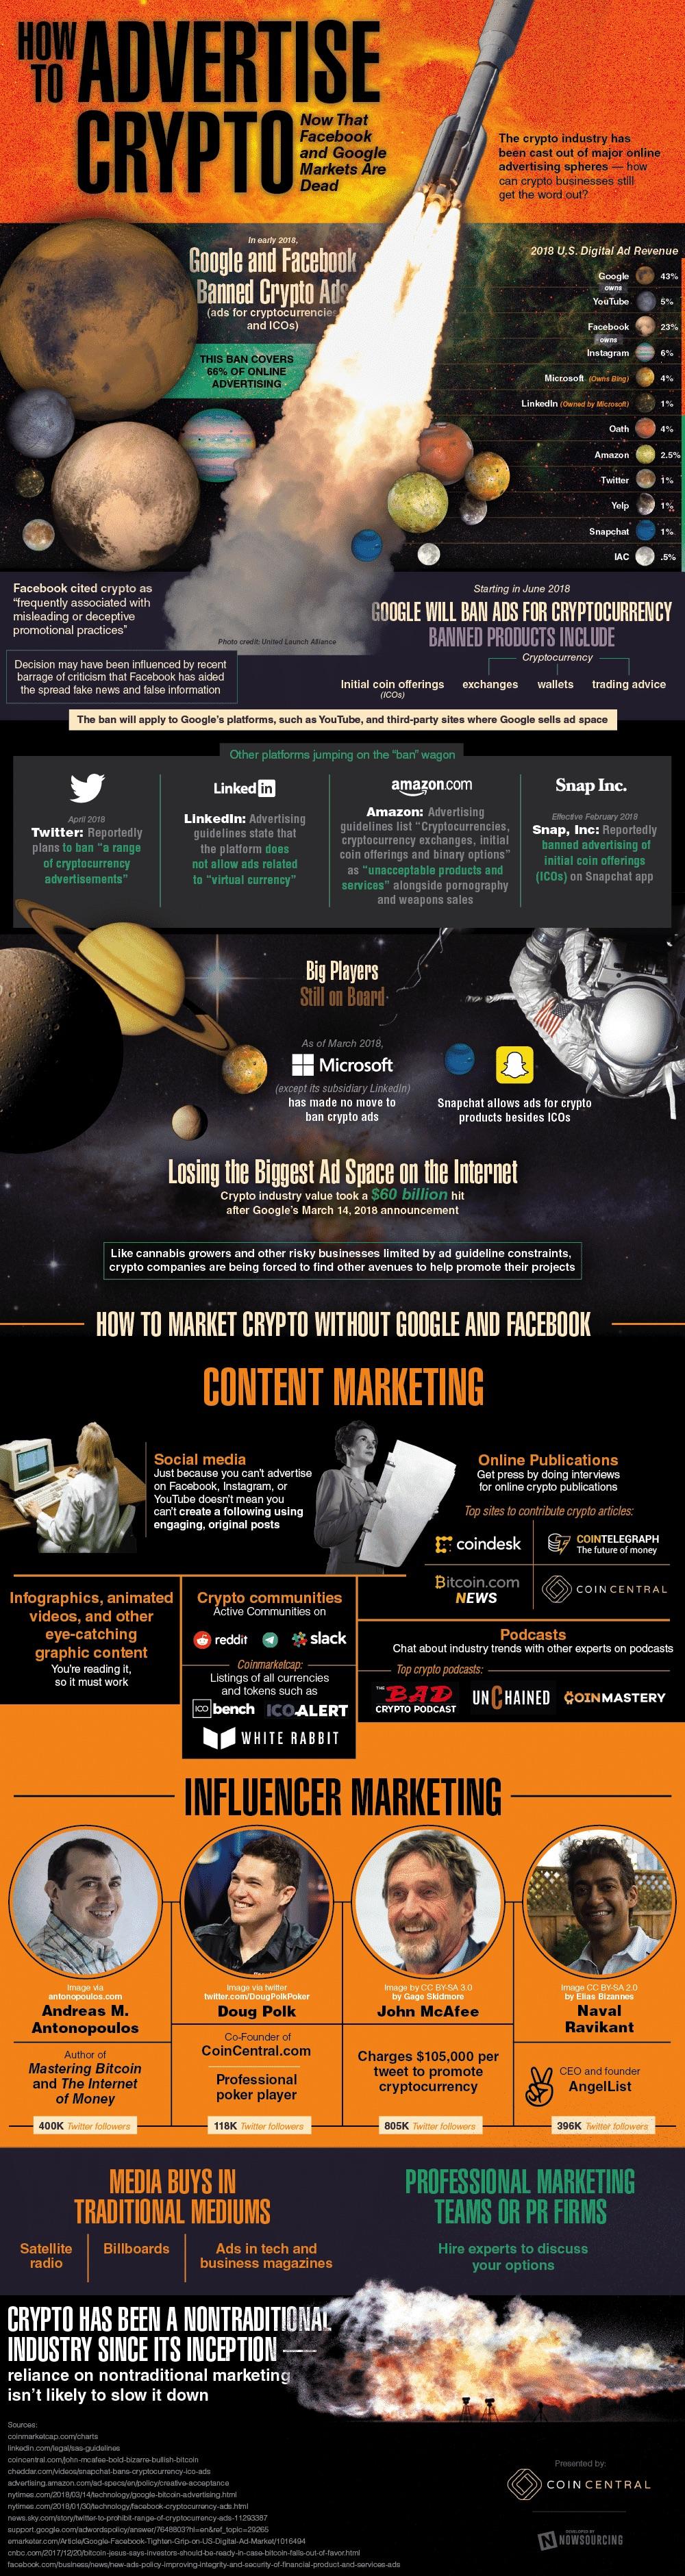 Advertise Crypto info